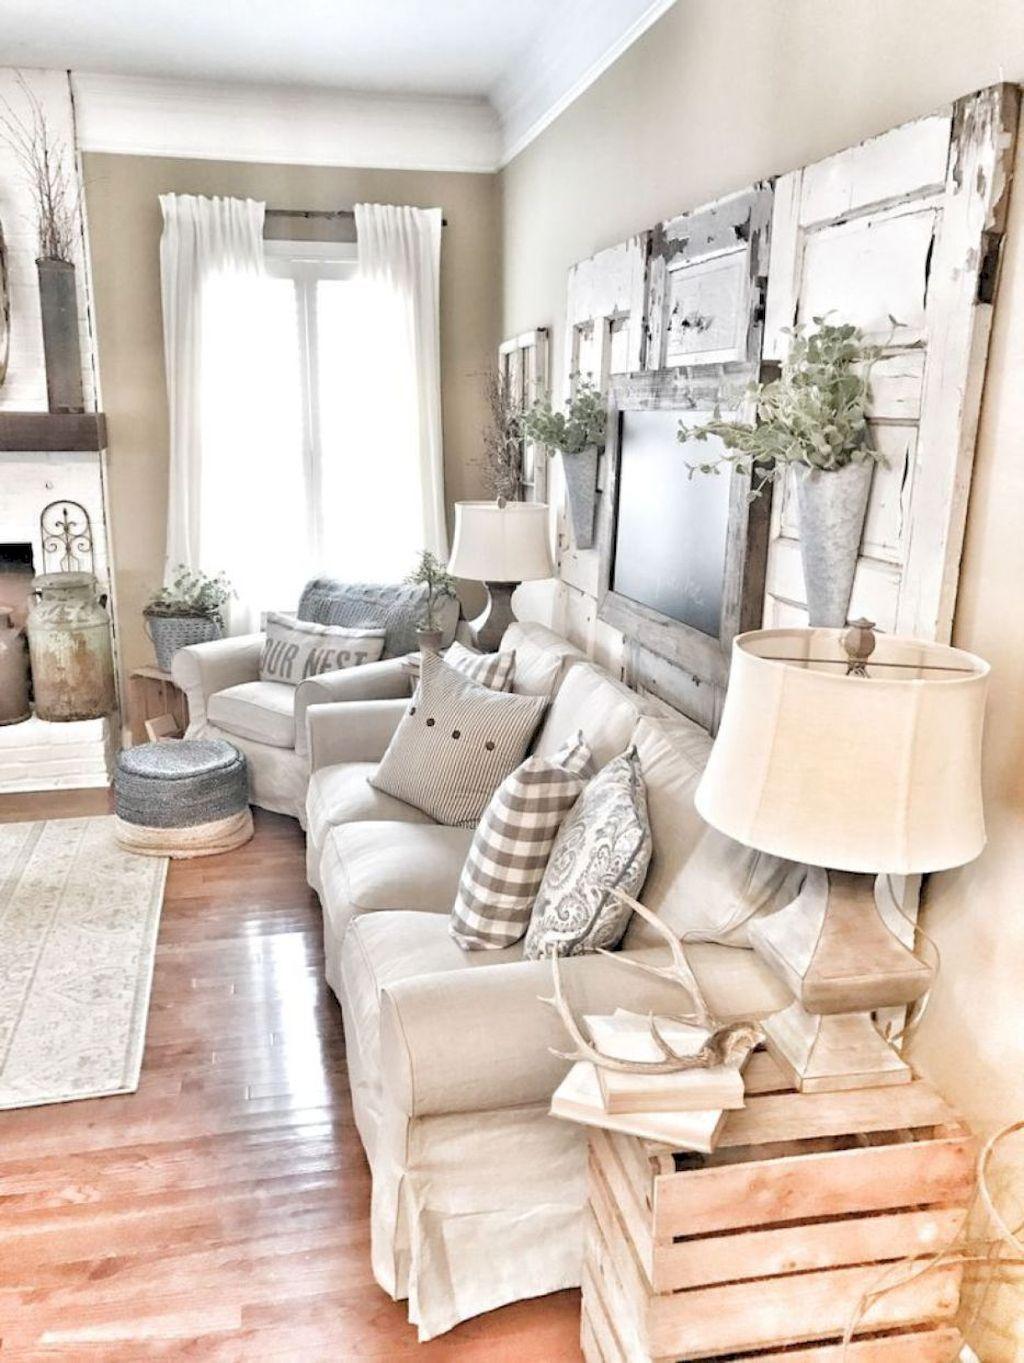 55 Rustic Modern Farmhouse Living Room Decor Ideas | Modern ...